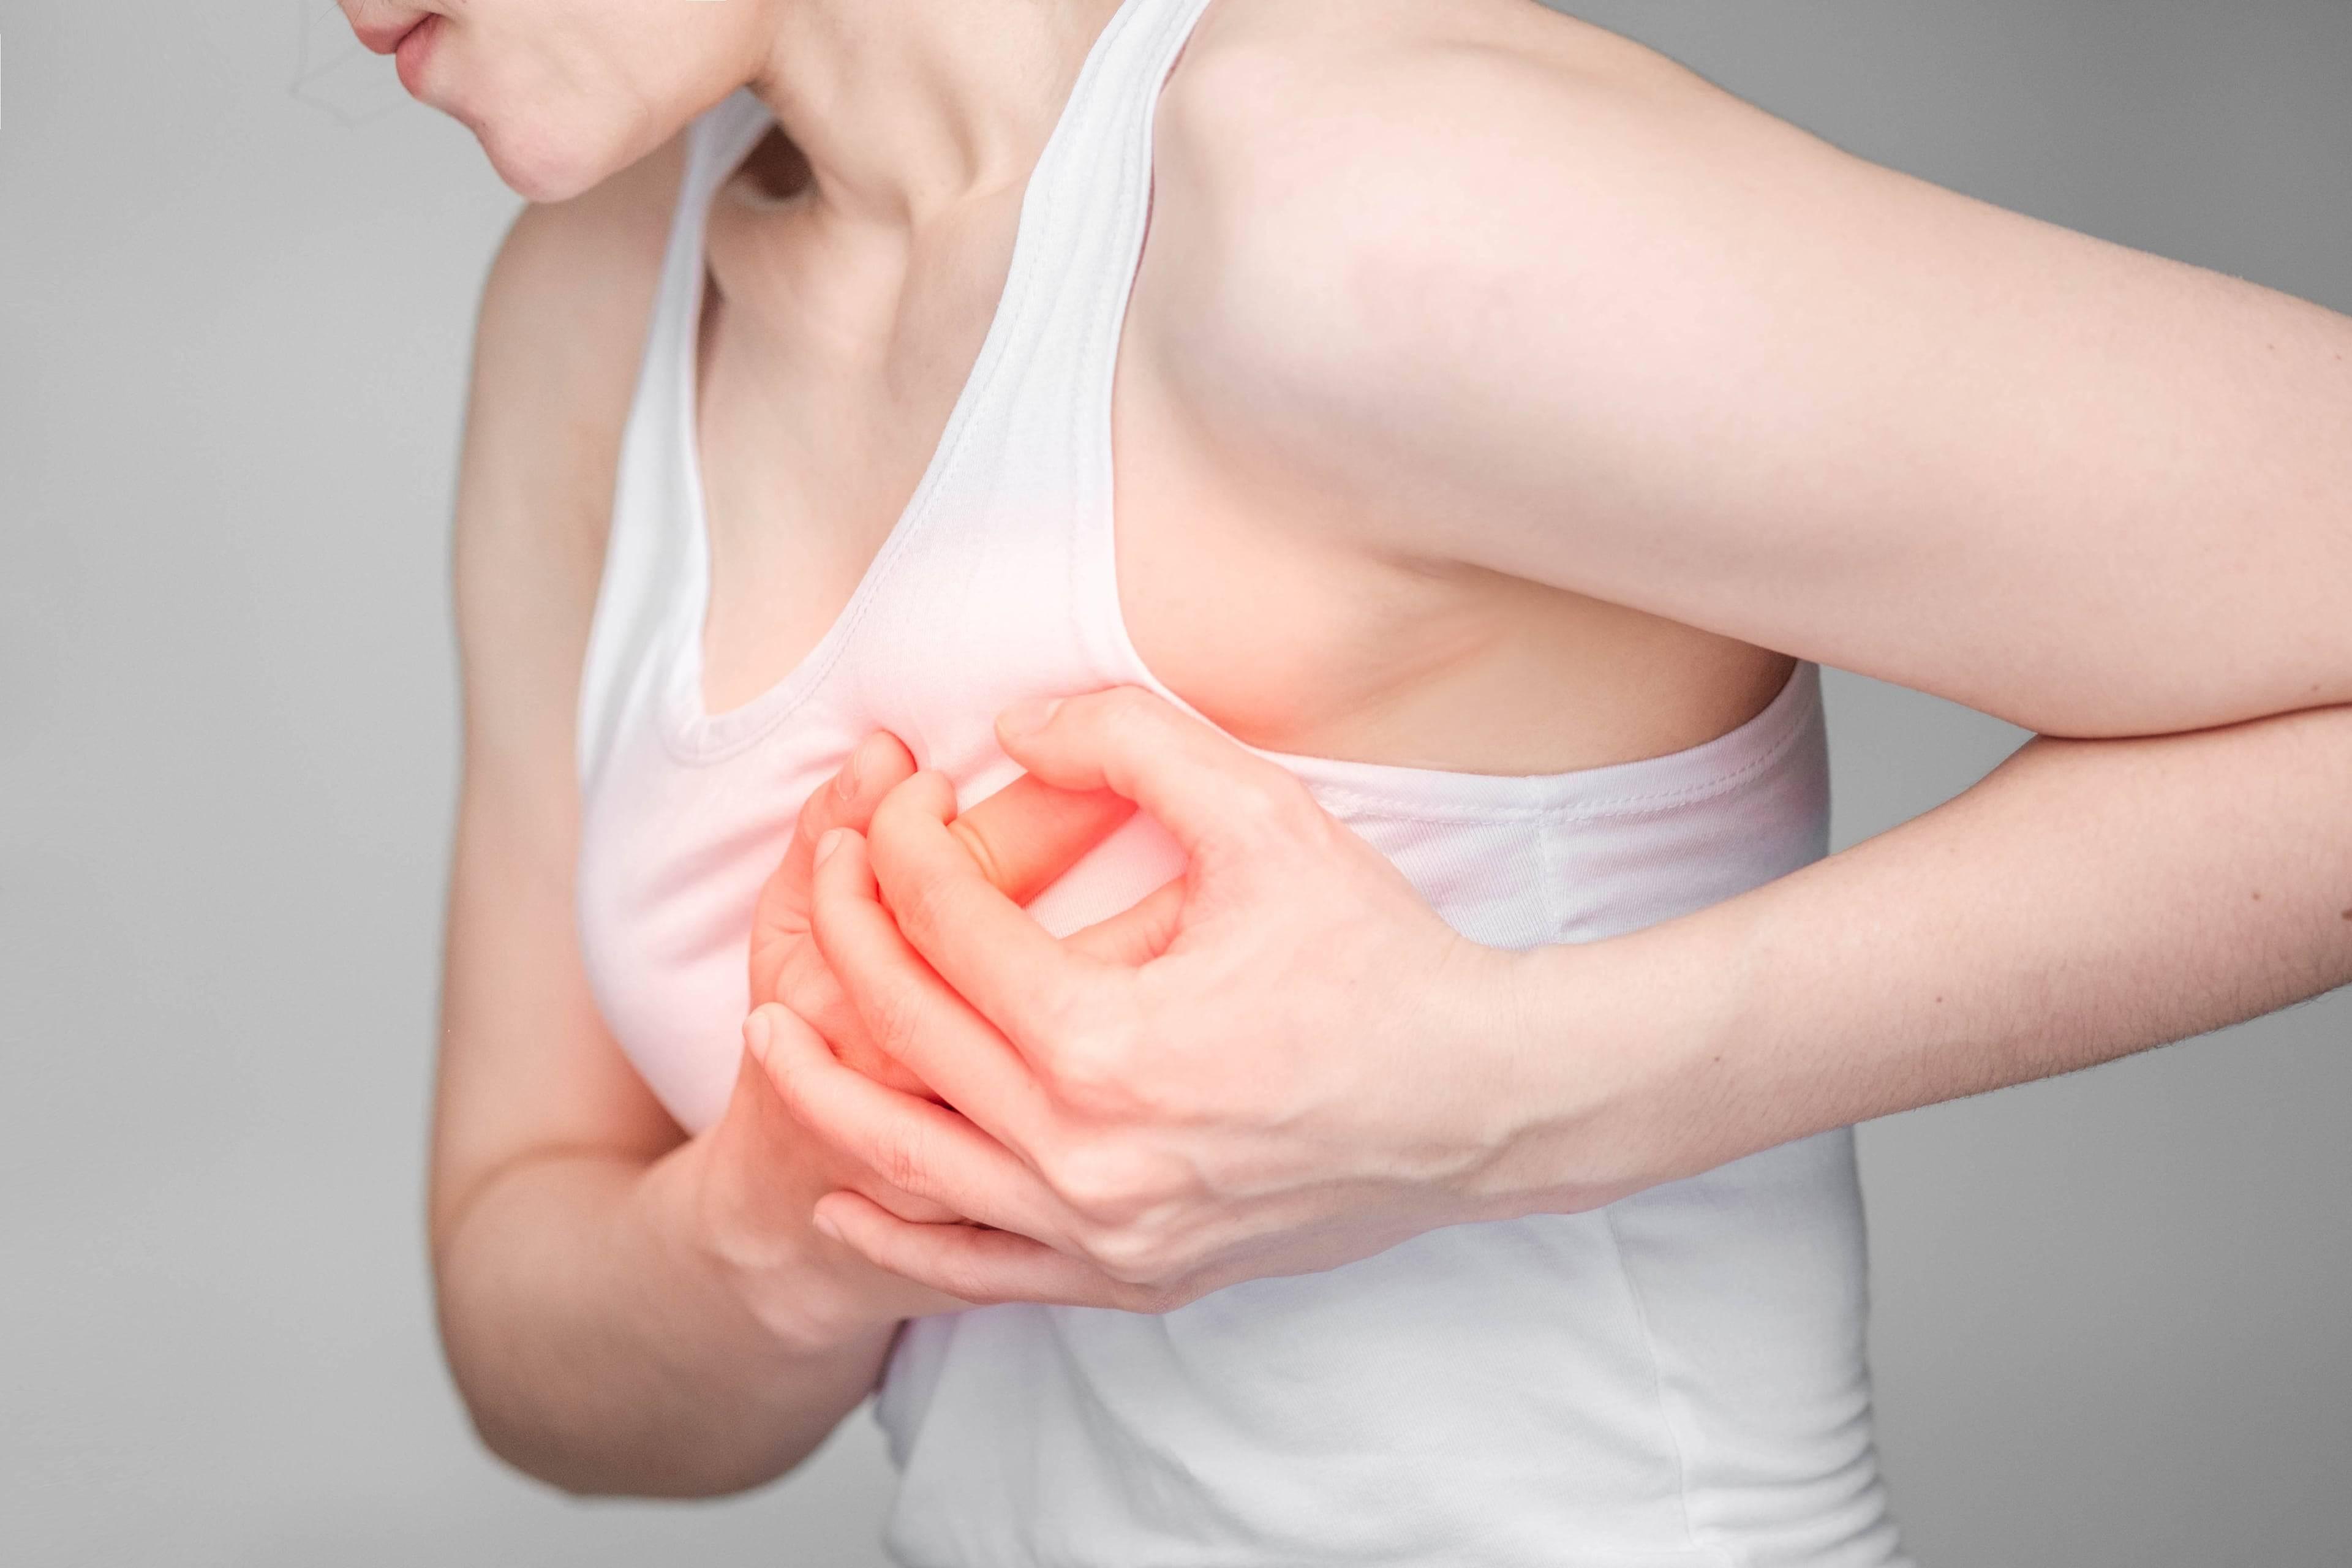 боль в области молочной железы